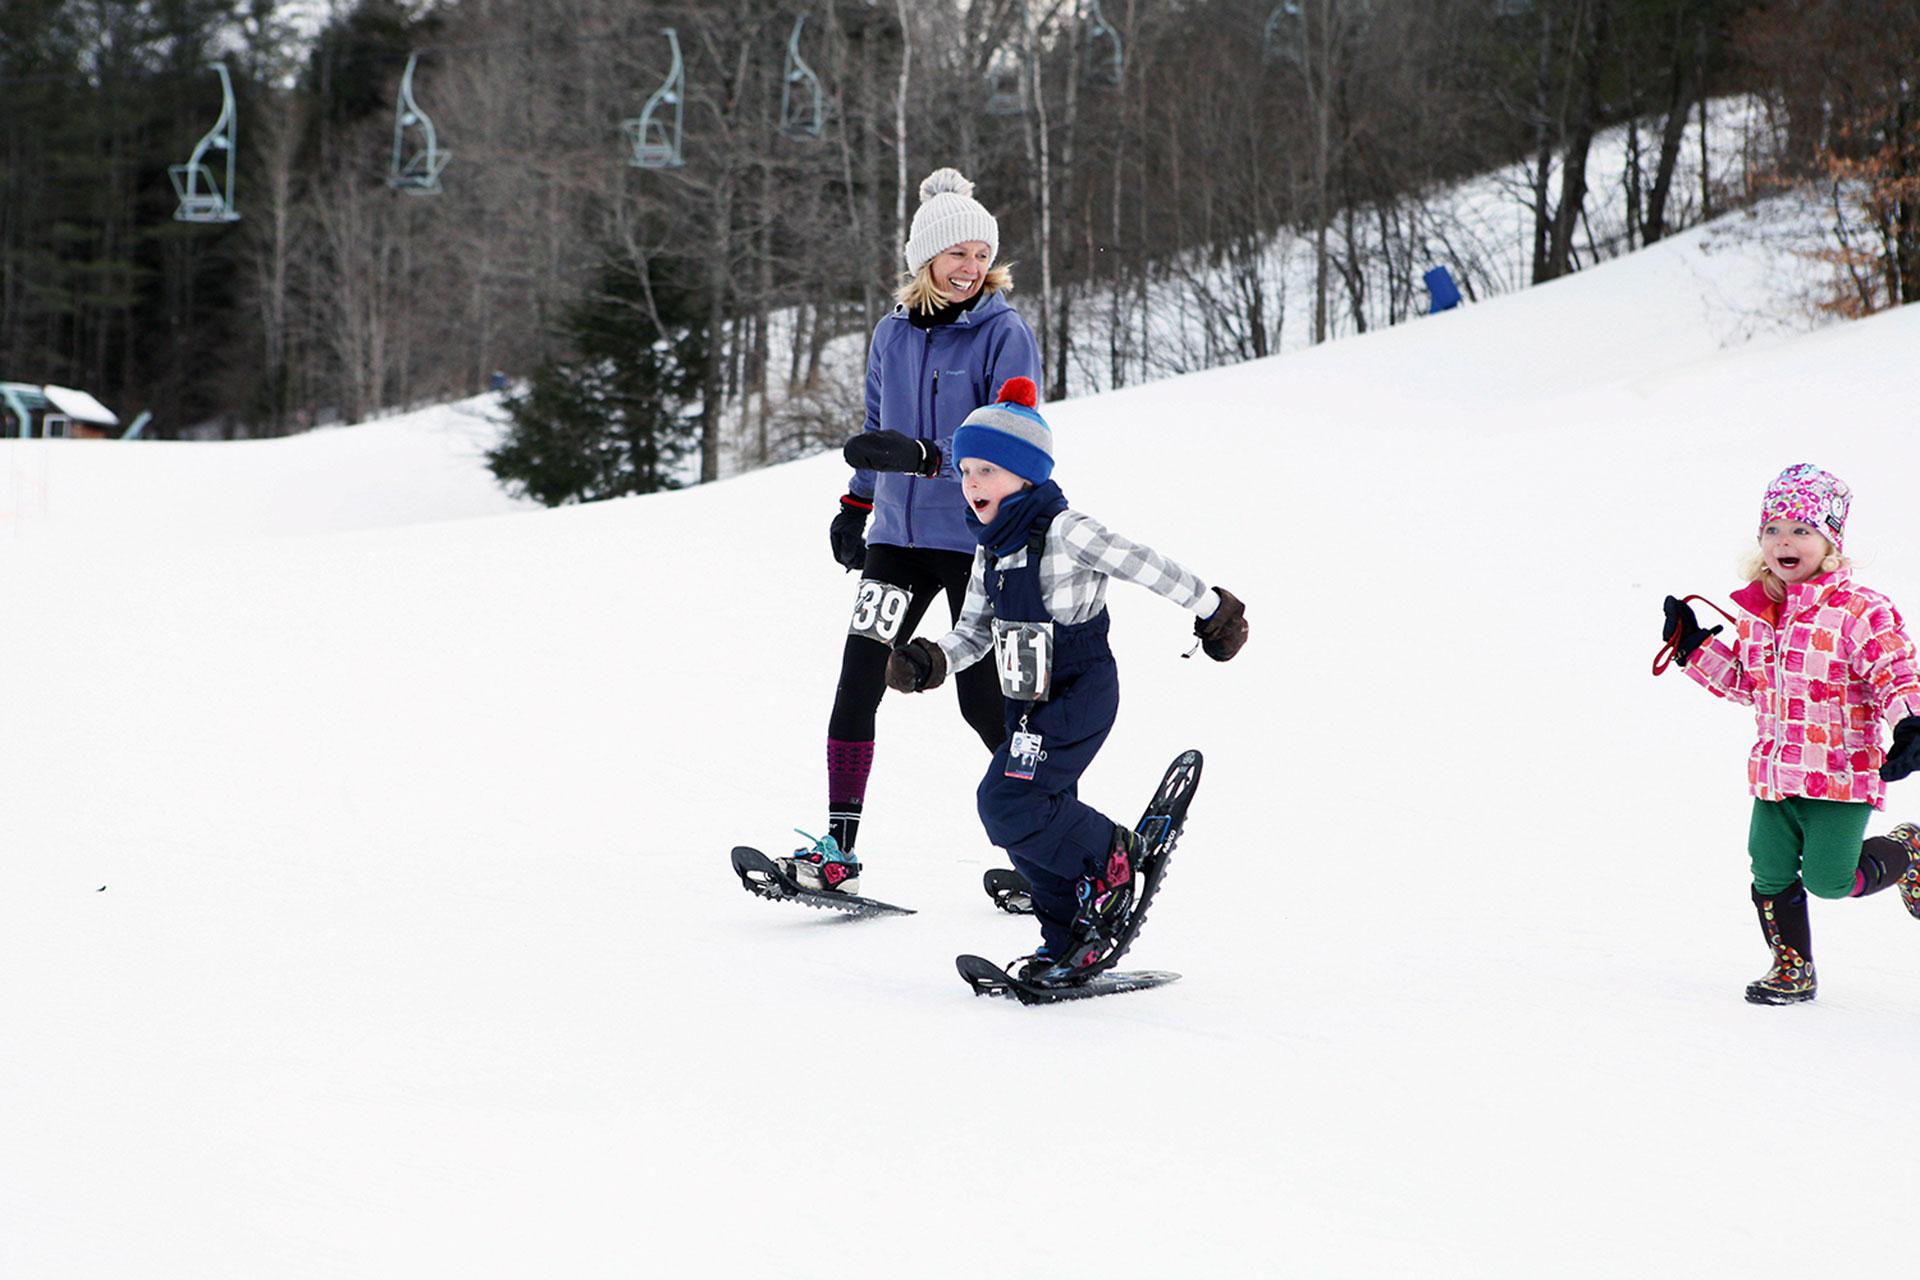 Snowshoeing at Woodstock Inn in Vermont